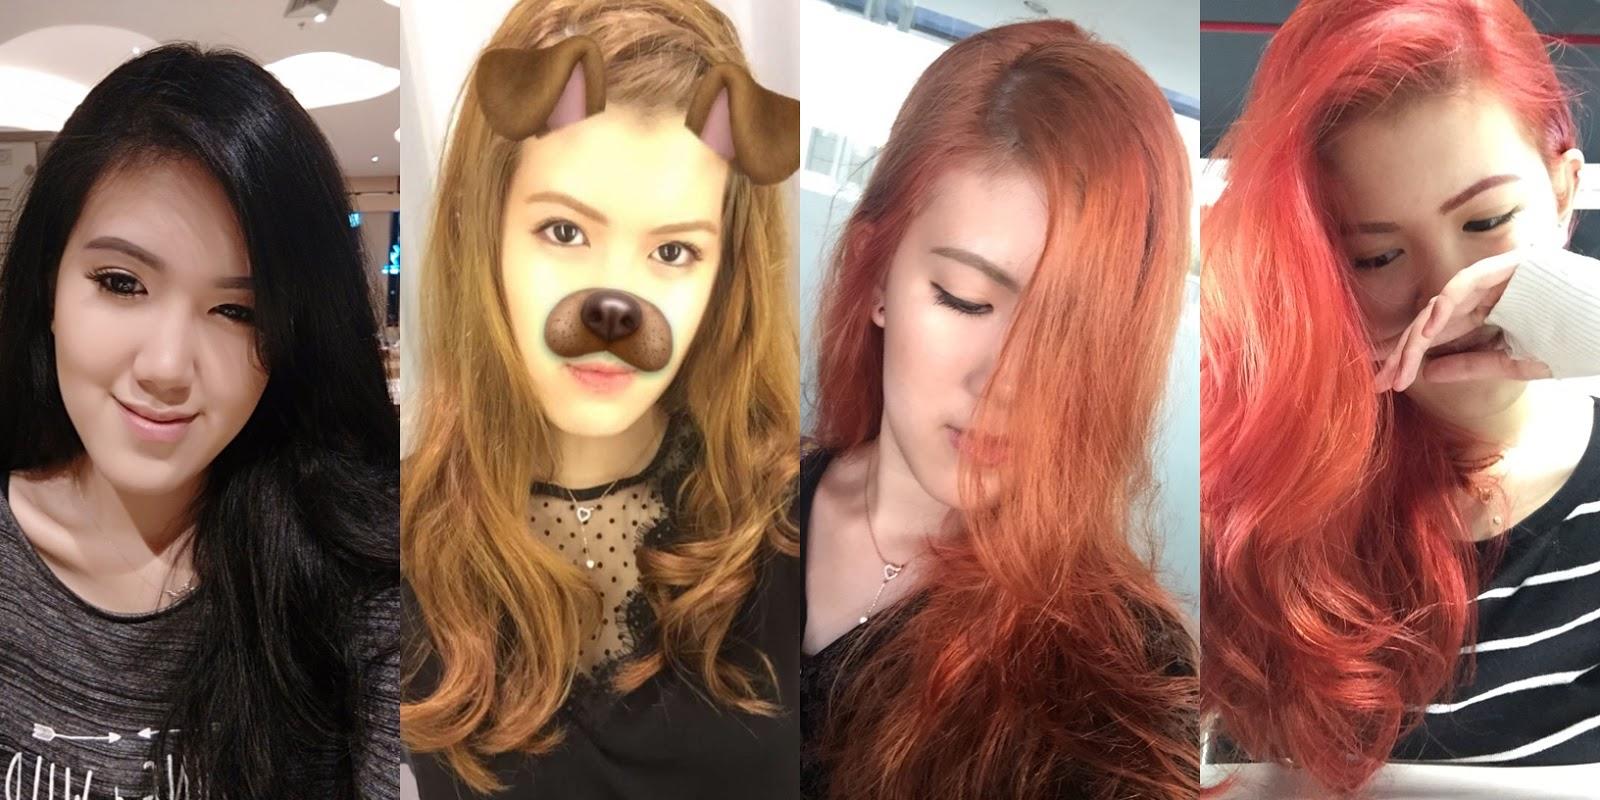 Janes Blog Pravana Vivids Red Vs X Pert Hair Color Mask Red Reviews